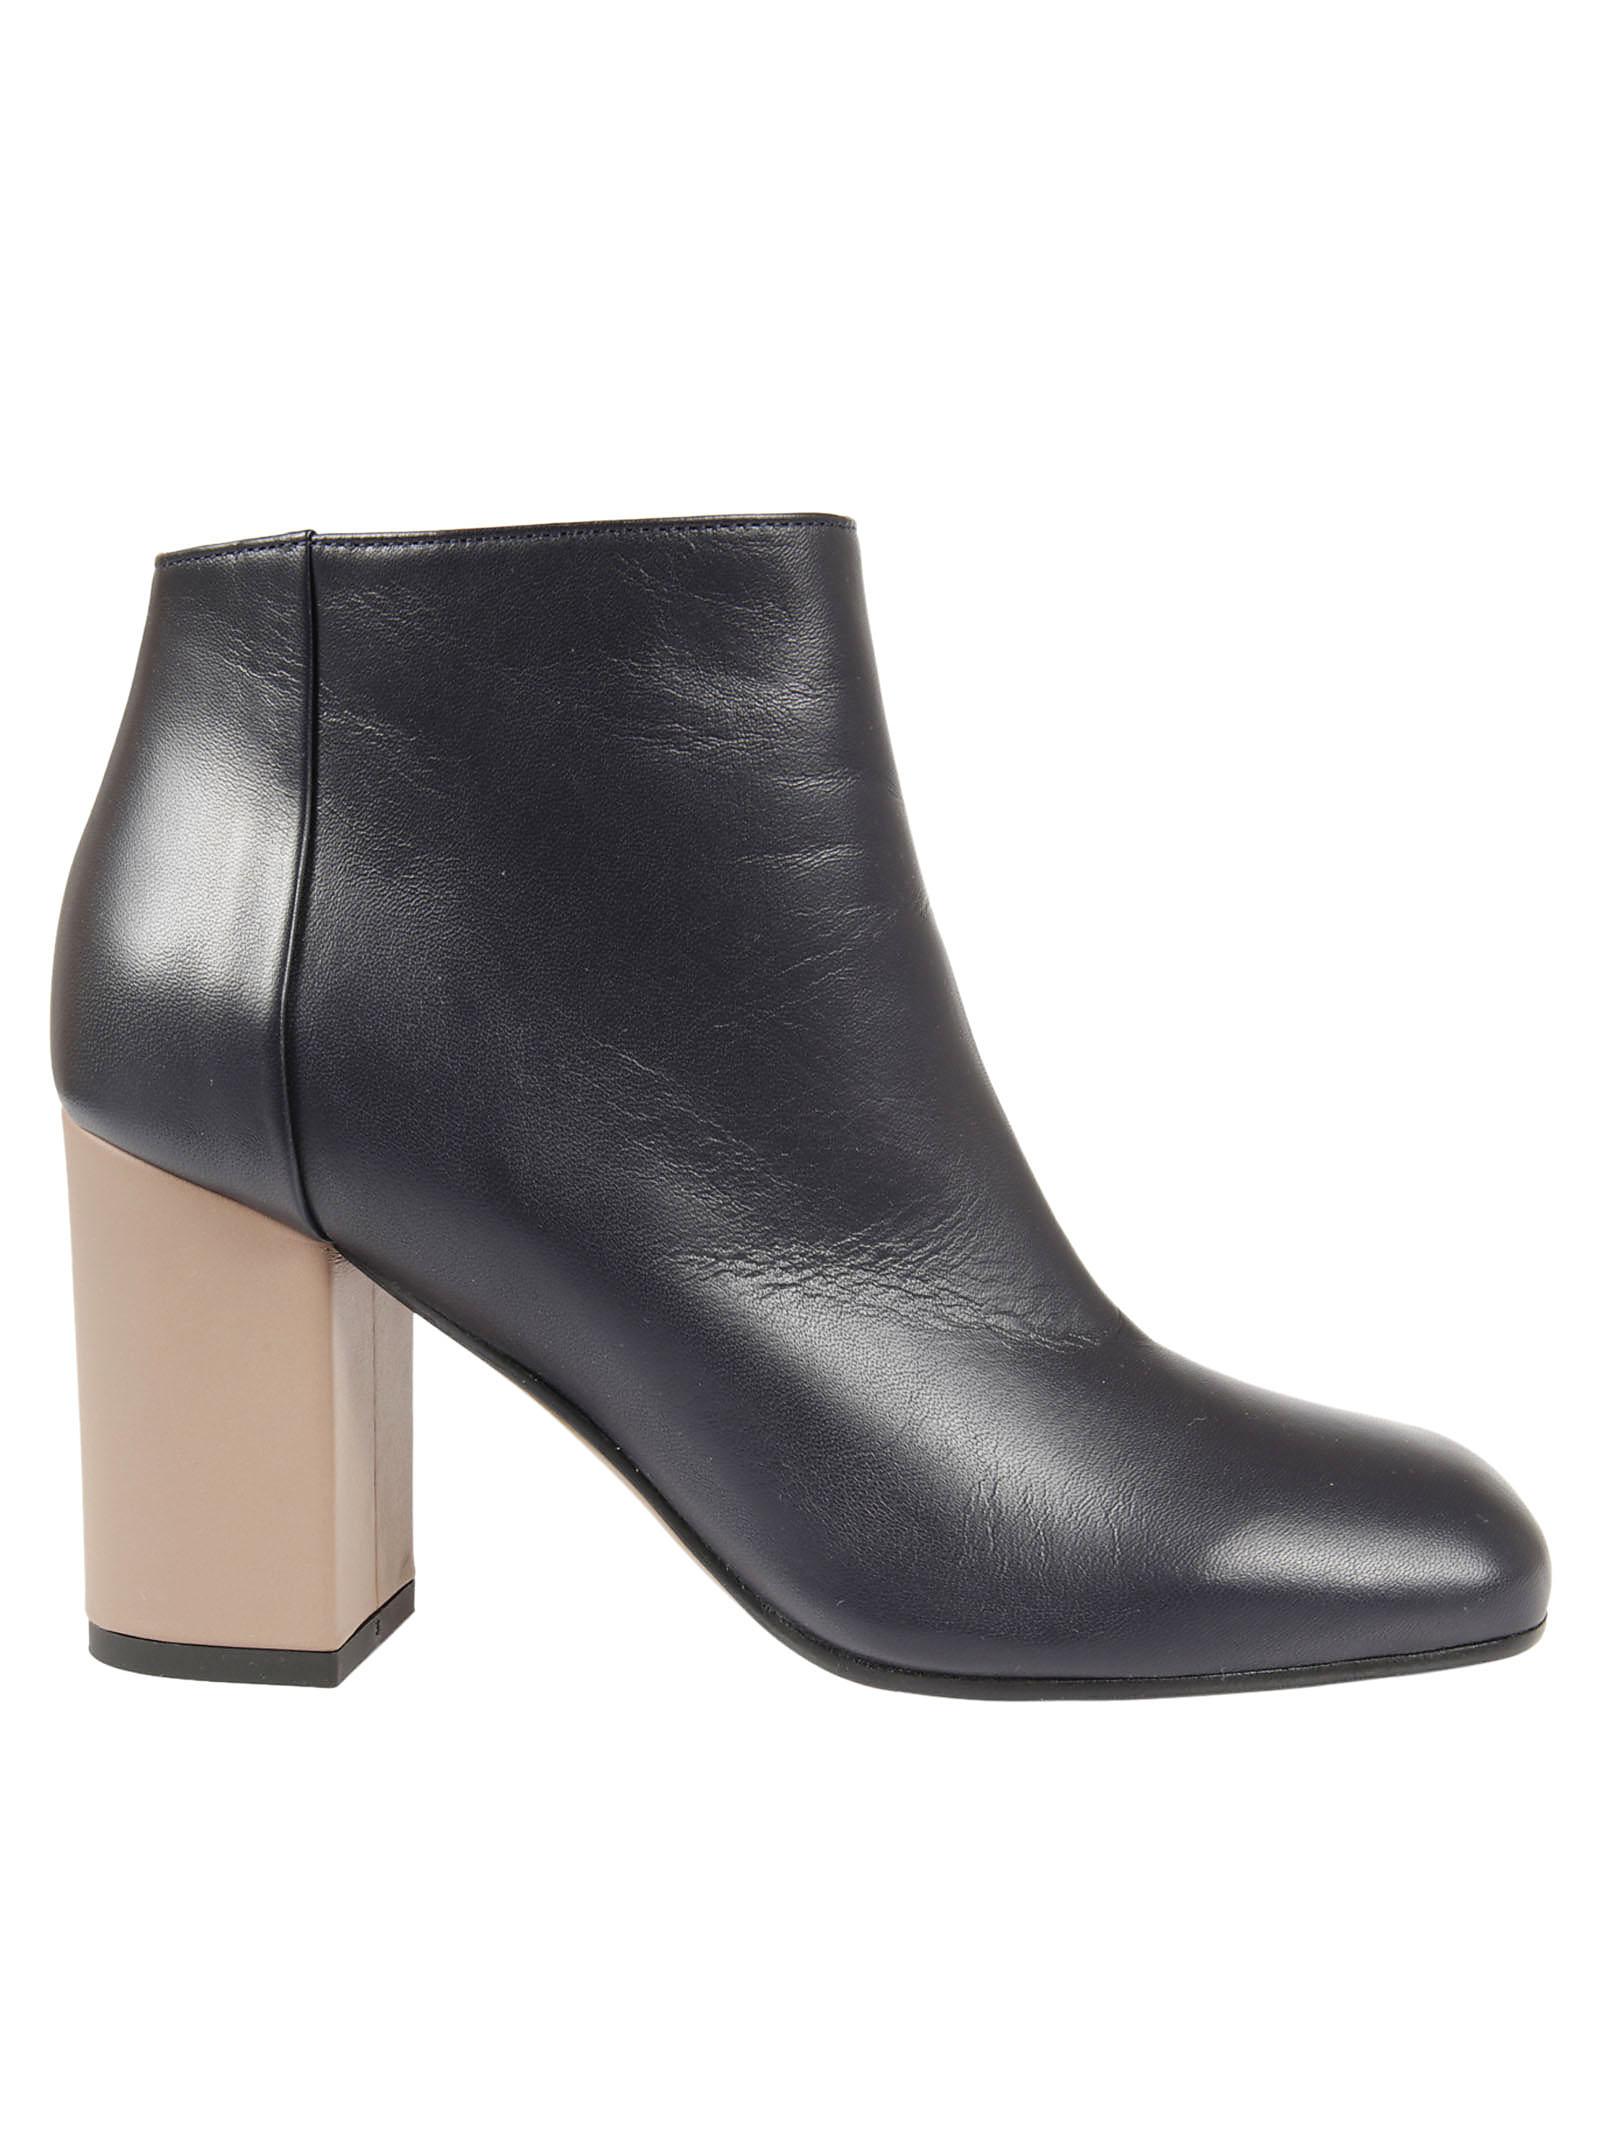 Marni Marni Leather Ankle Boots